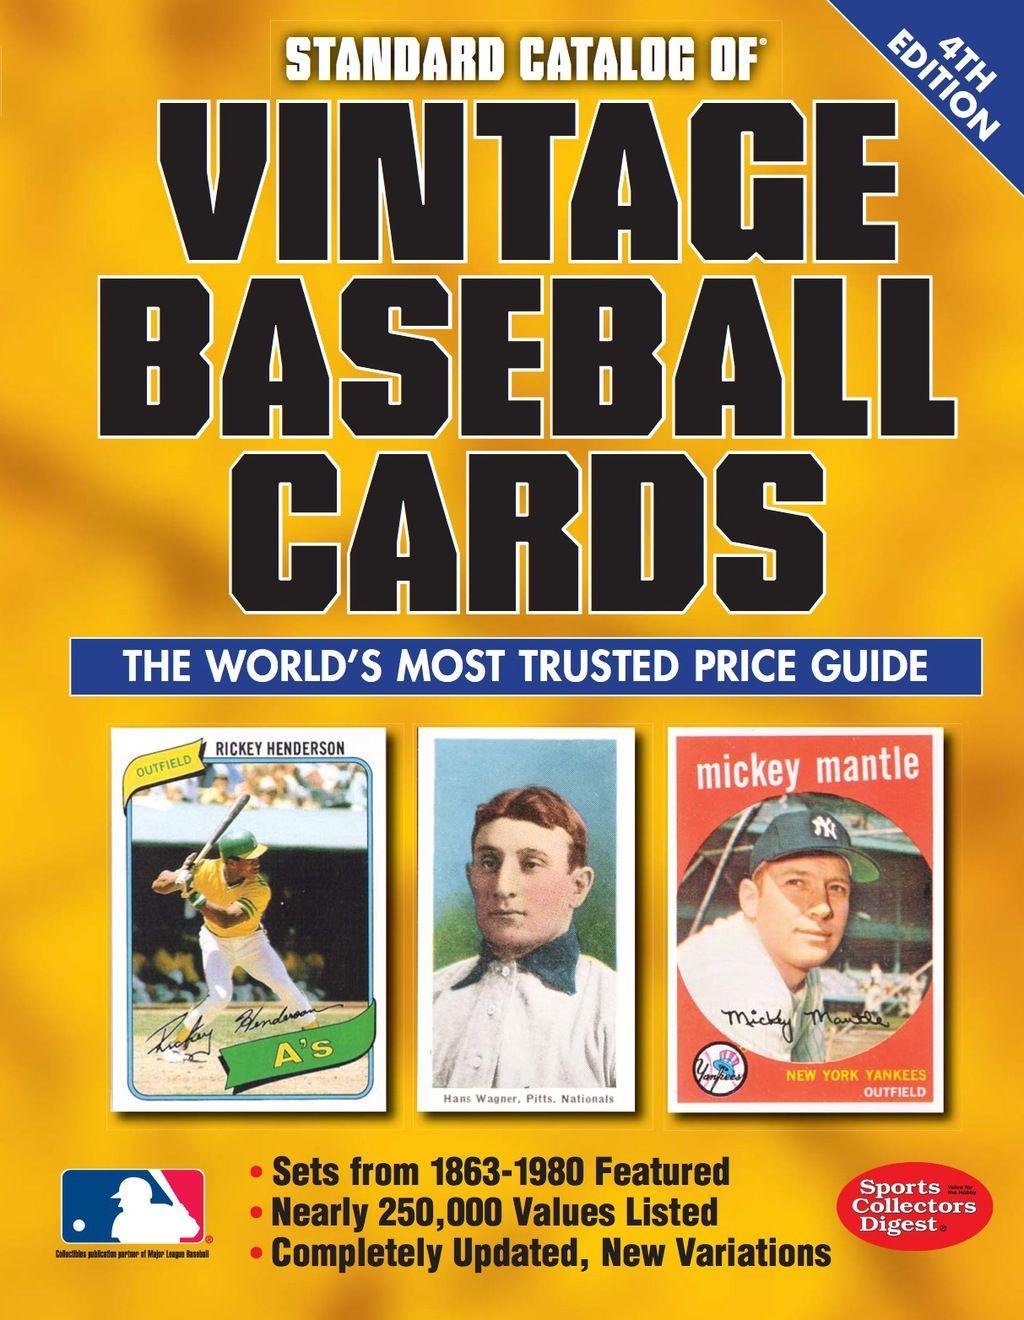 Standard Catalog of Vintage Baseball Cards (eBook) in 2020